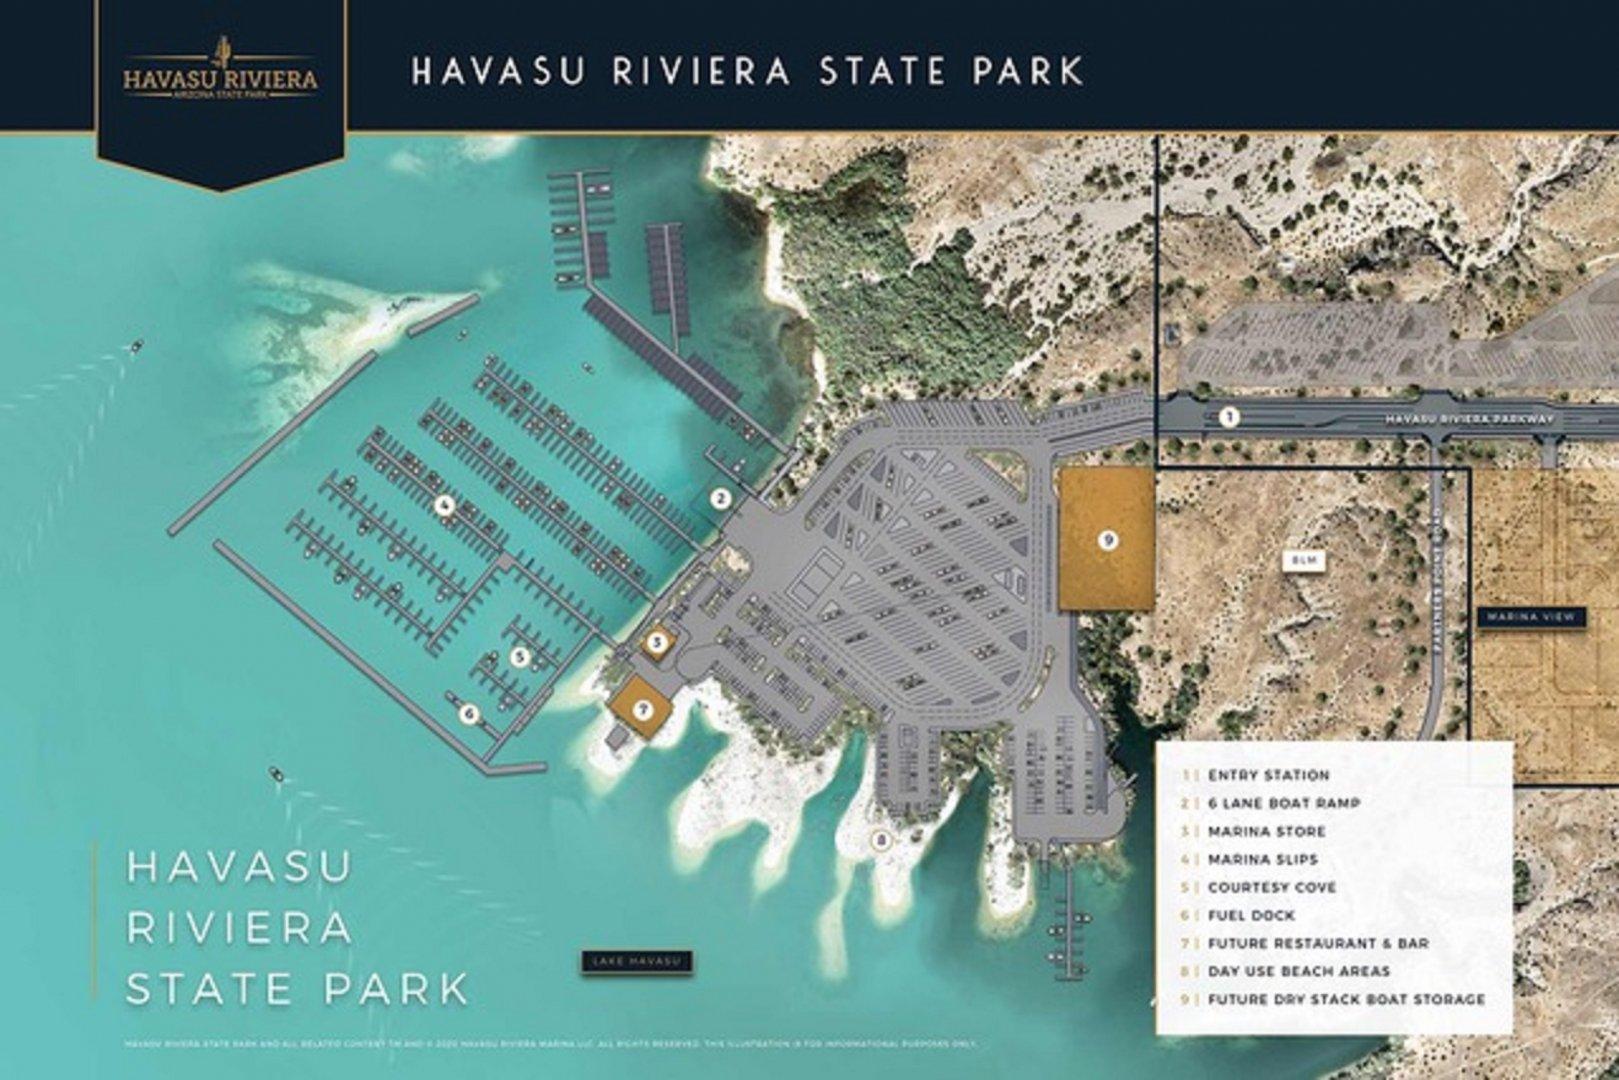 Havasu-Riviera-State-Park.jpeg